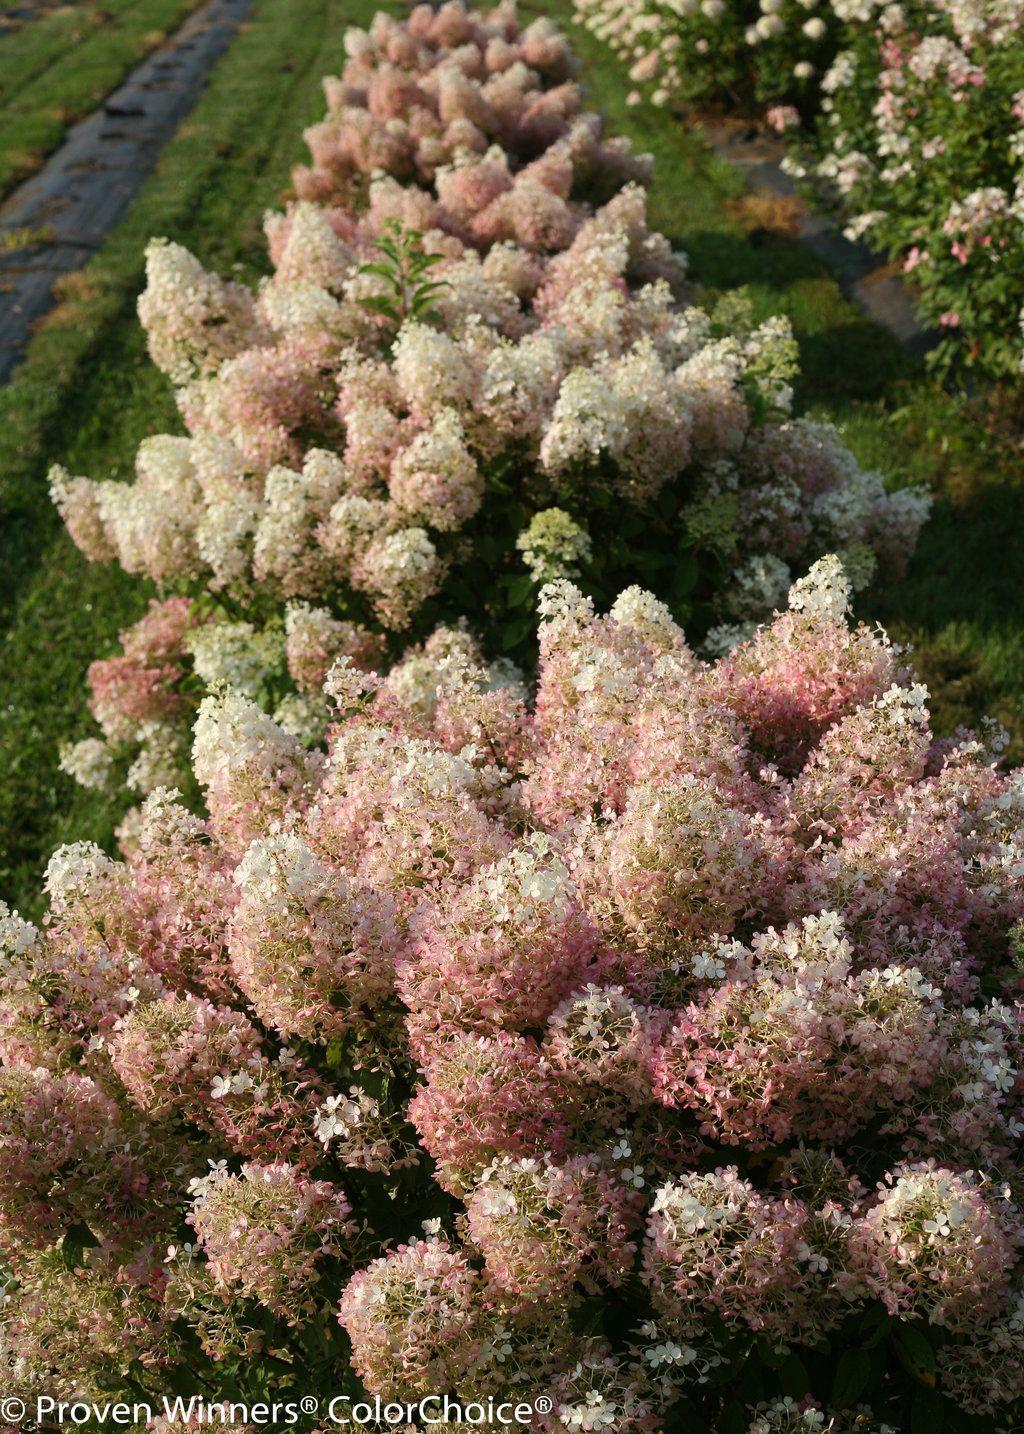 Bobo Hardy Hydrangea Hydrangea Paniculata Hydrangea Landscaping Bobo Hydrangea Hydrangea Garden